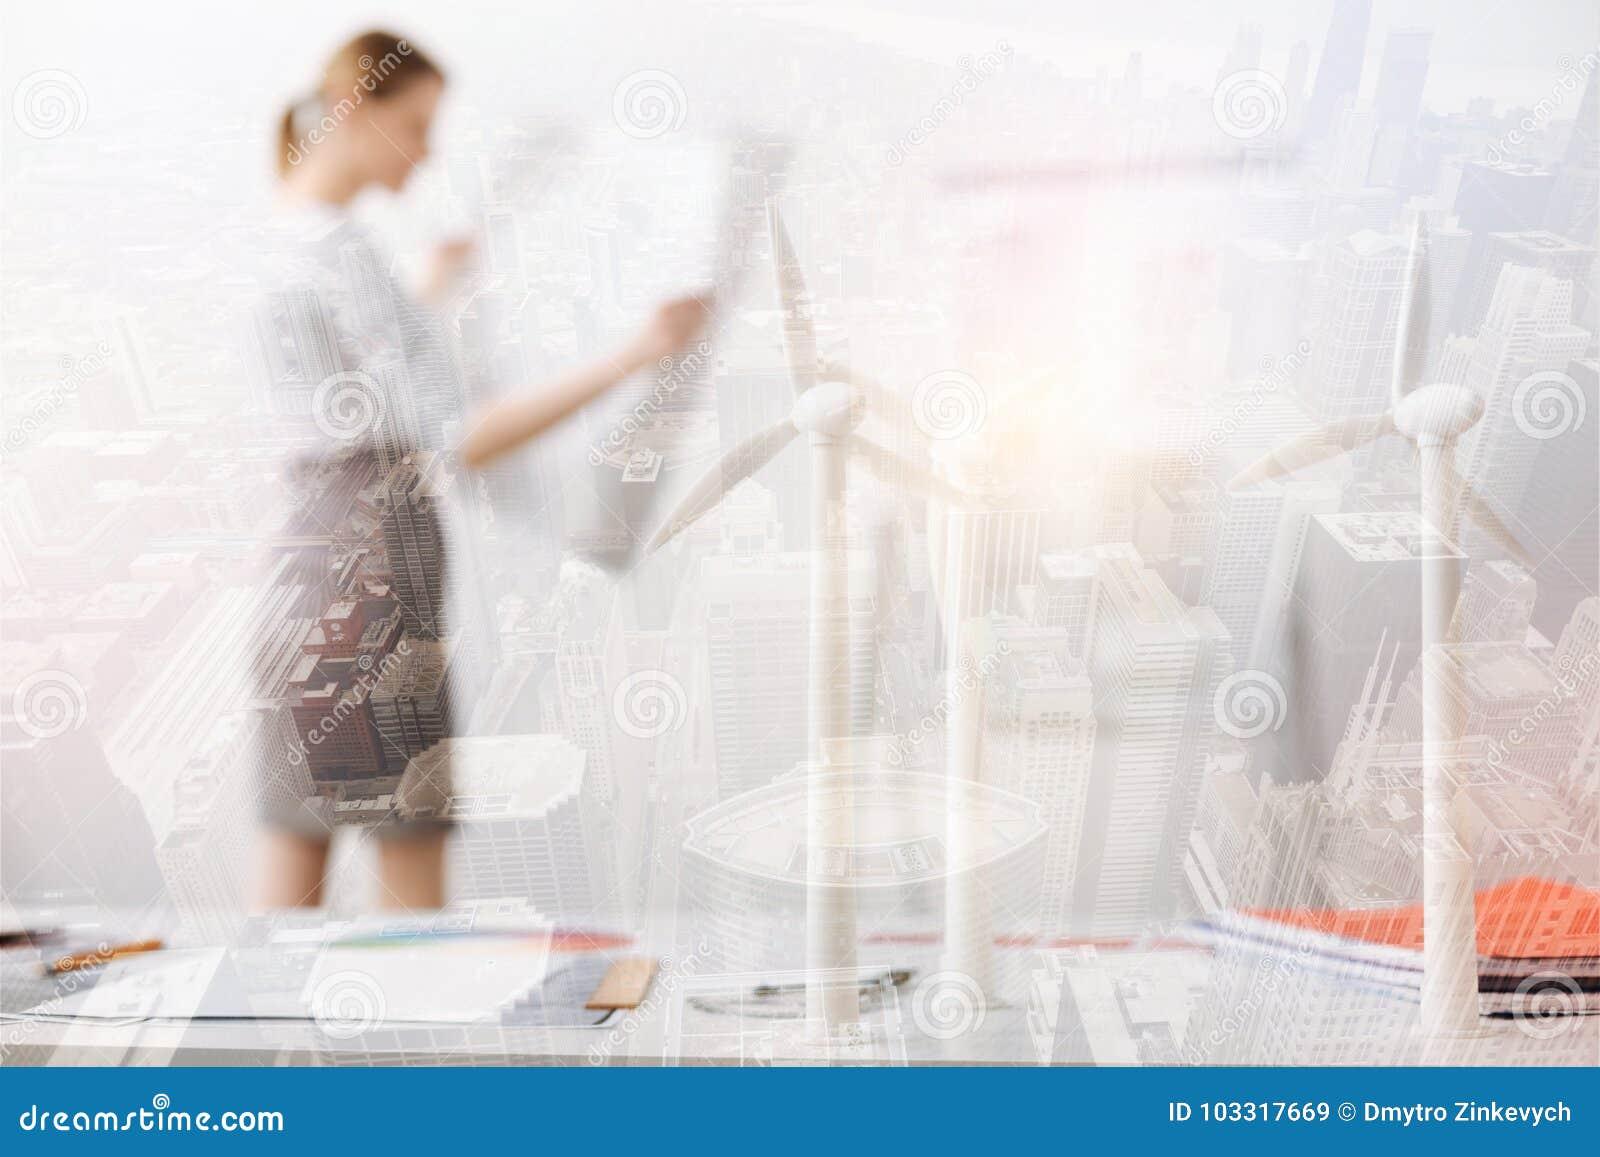 Den selektiva fokusen av vind maler modeller på tabellen av en yrkesmässig tekniker